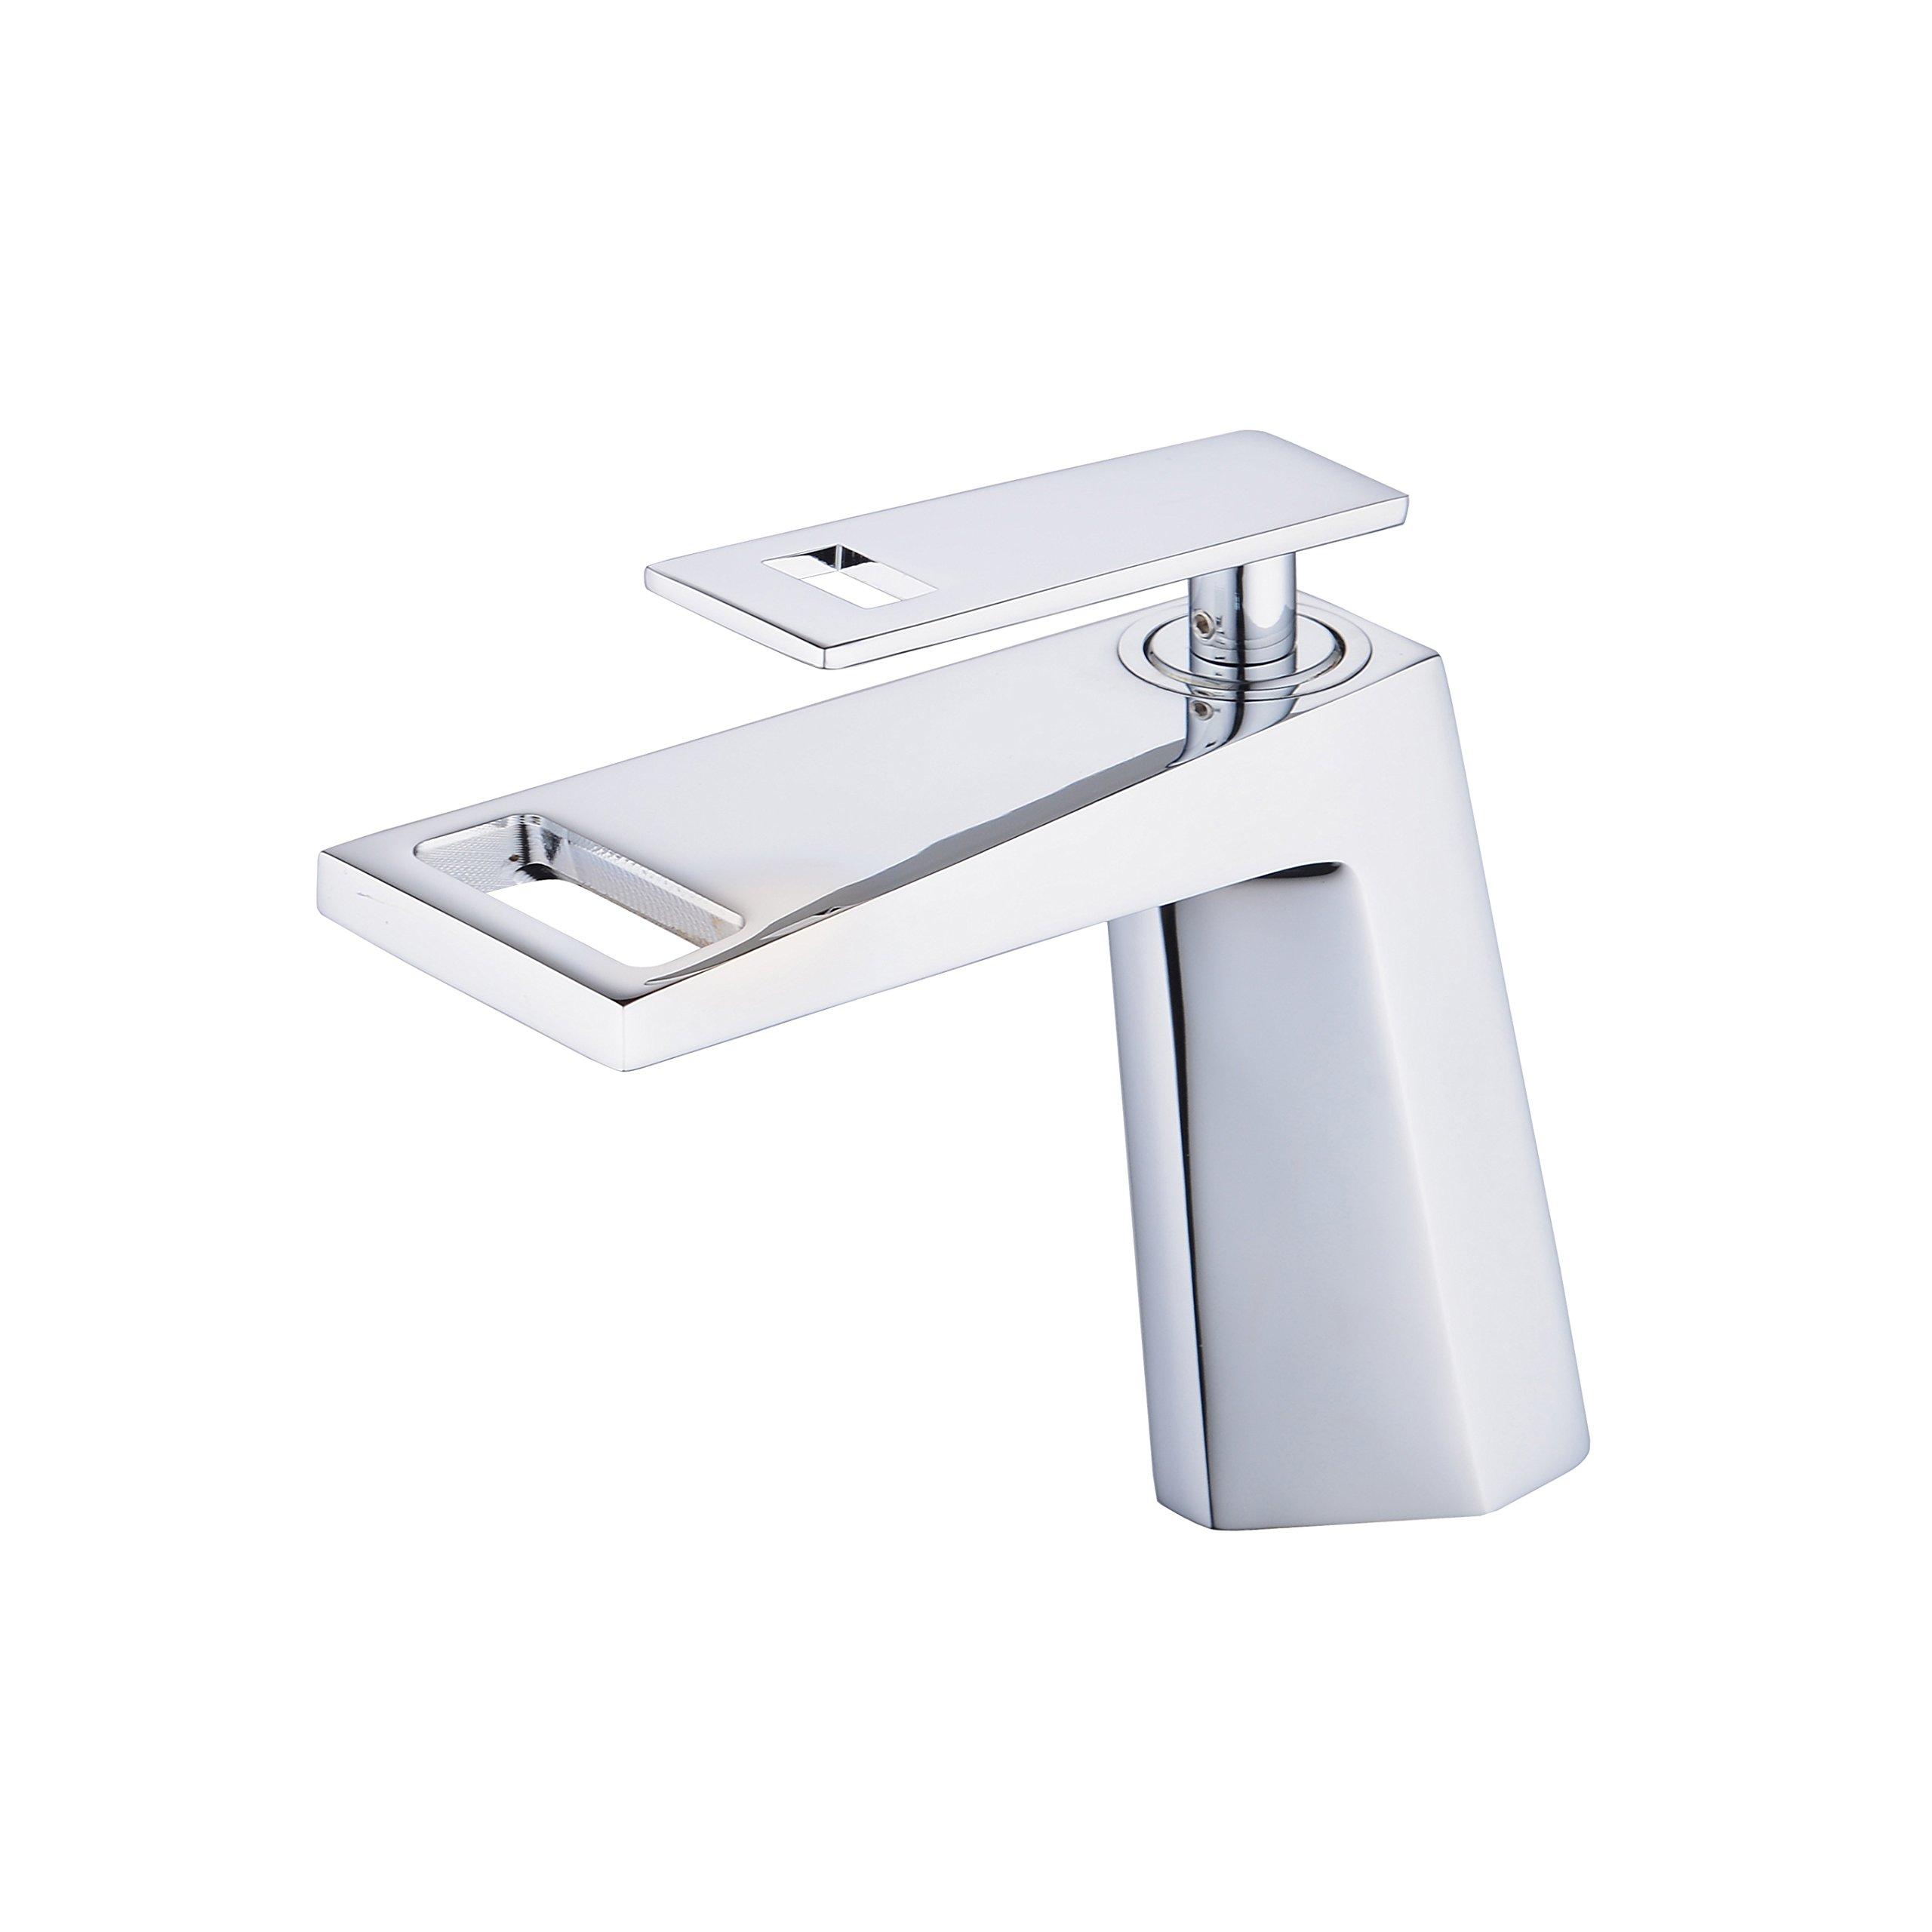 Waterfall Bathroom Sink Faucet,Unique Design Single Hole Single Handle Brass Lavatory Vanity Faucet,Lead Free,Chrome